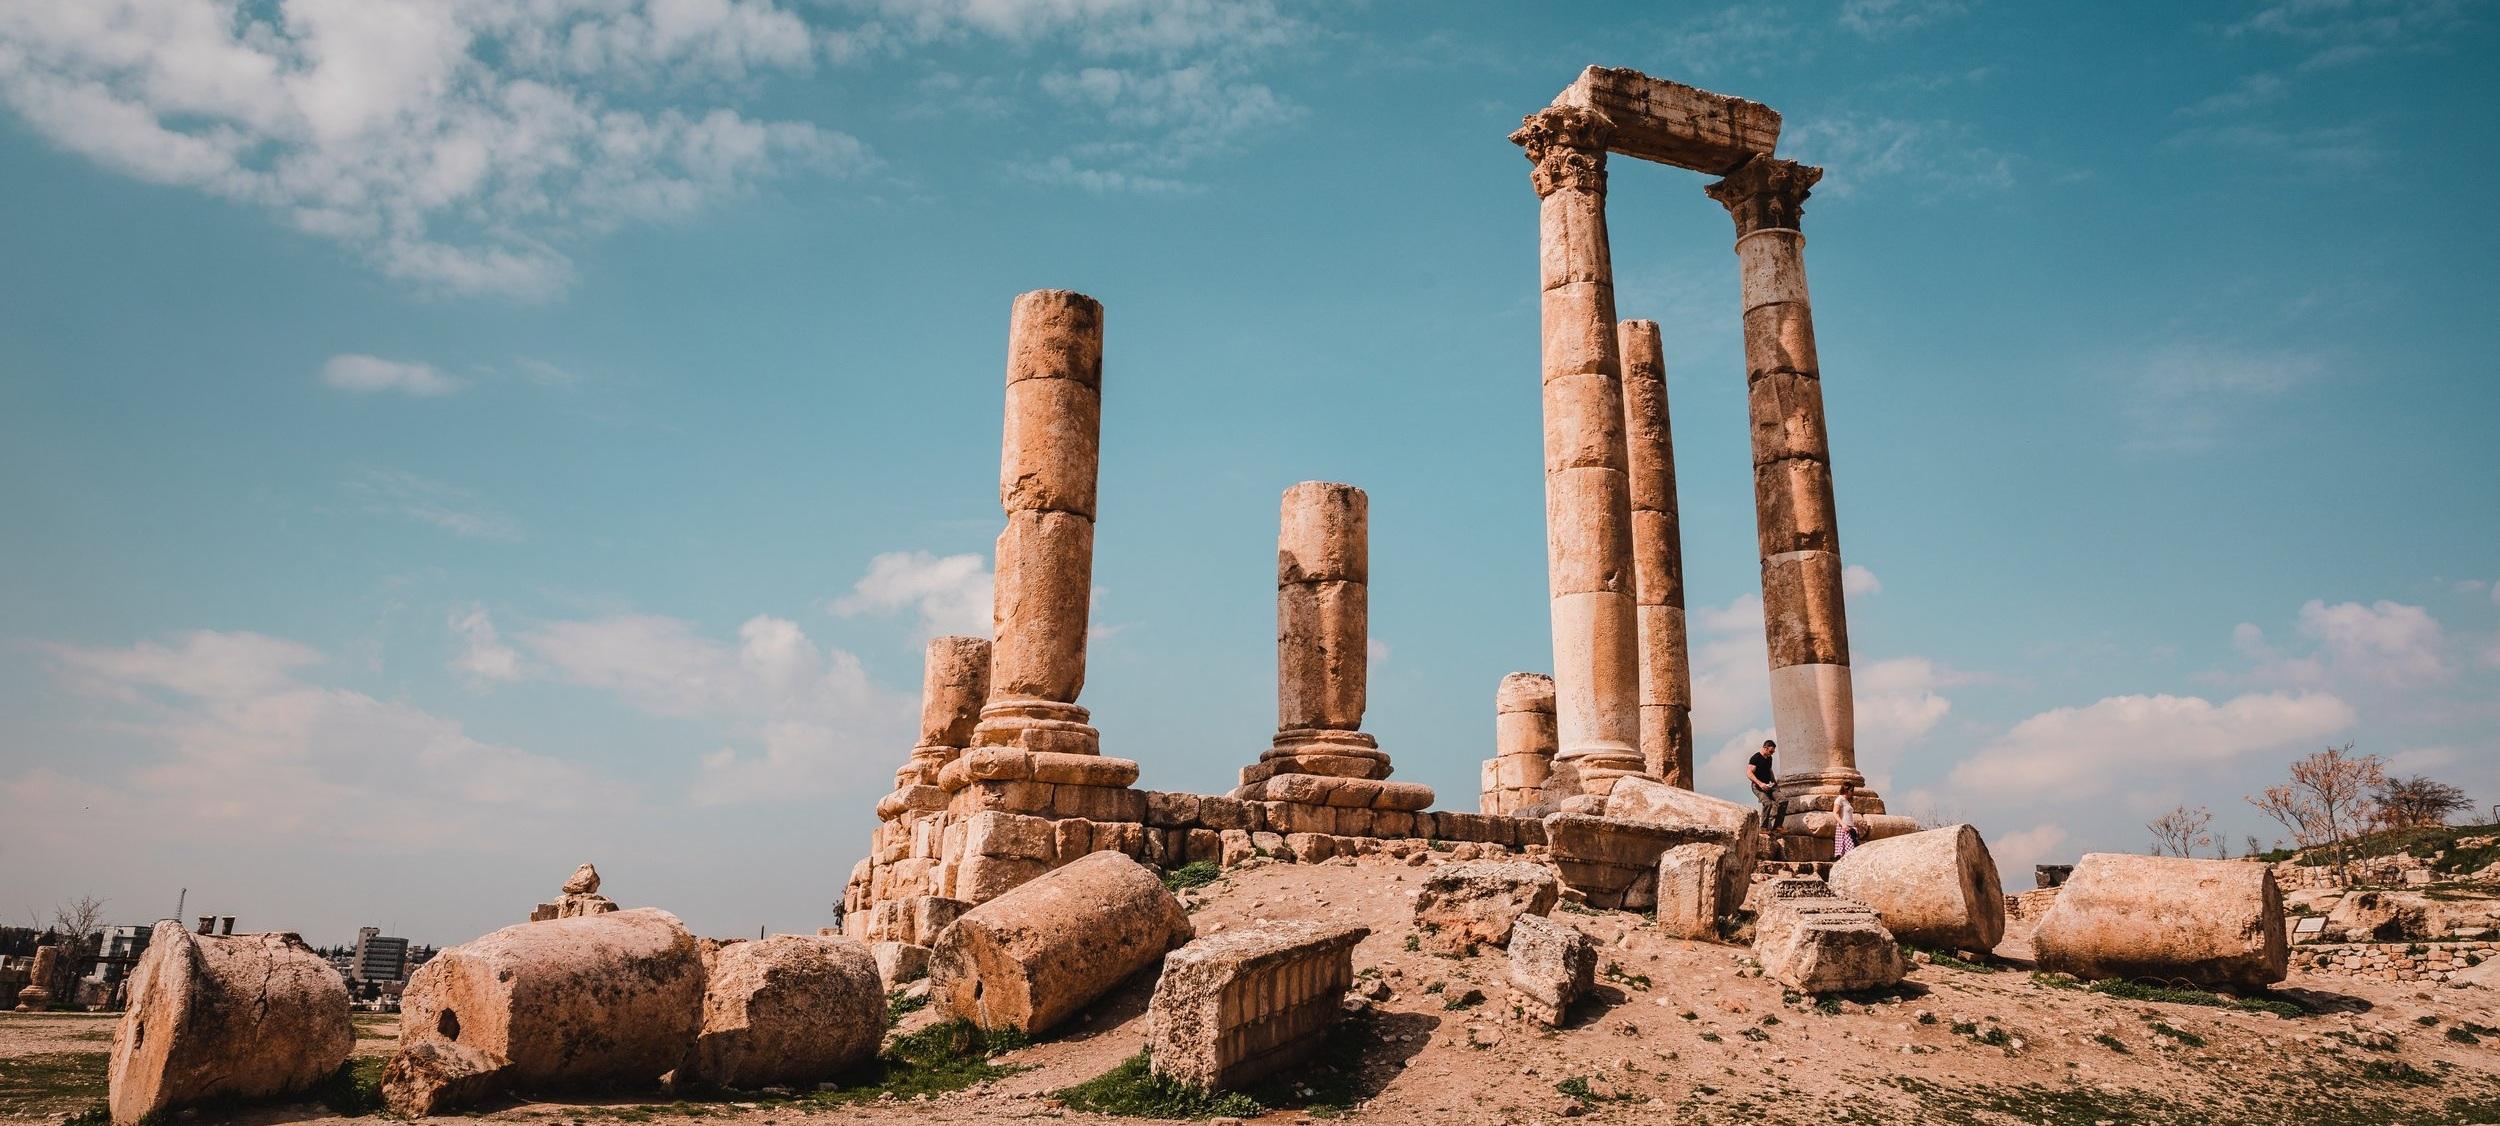 old-testament-ruins.jpg